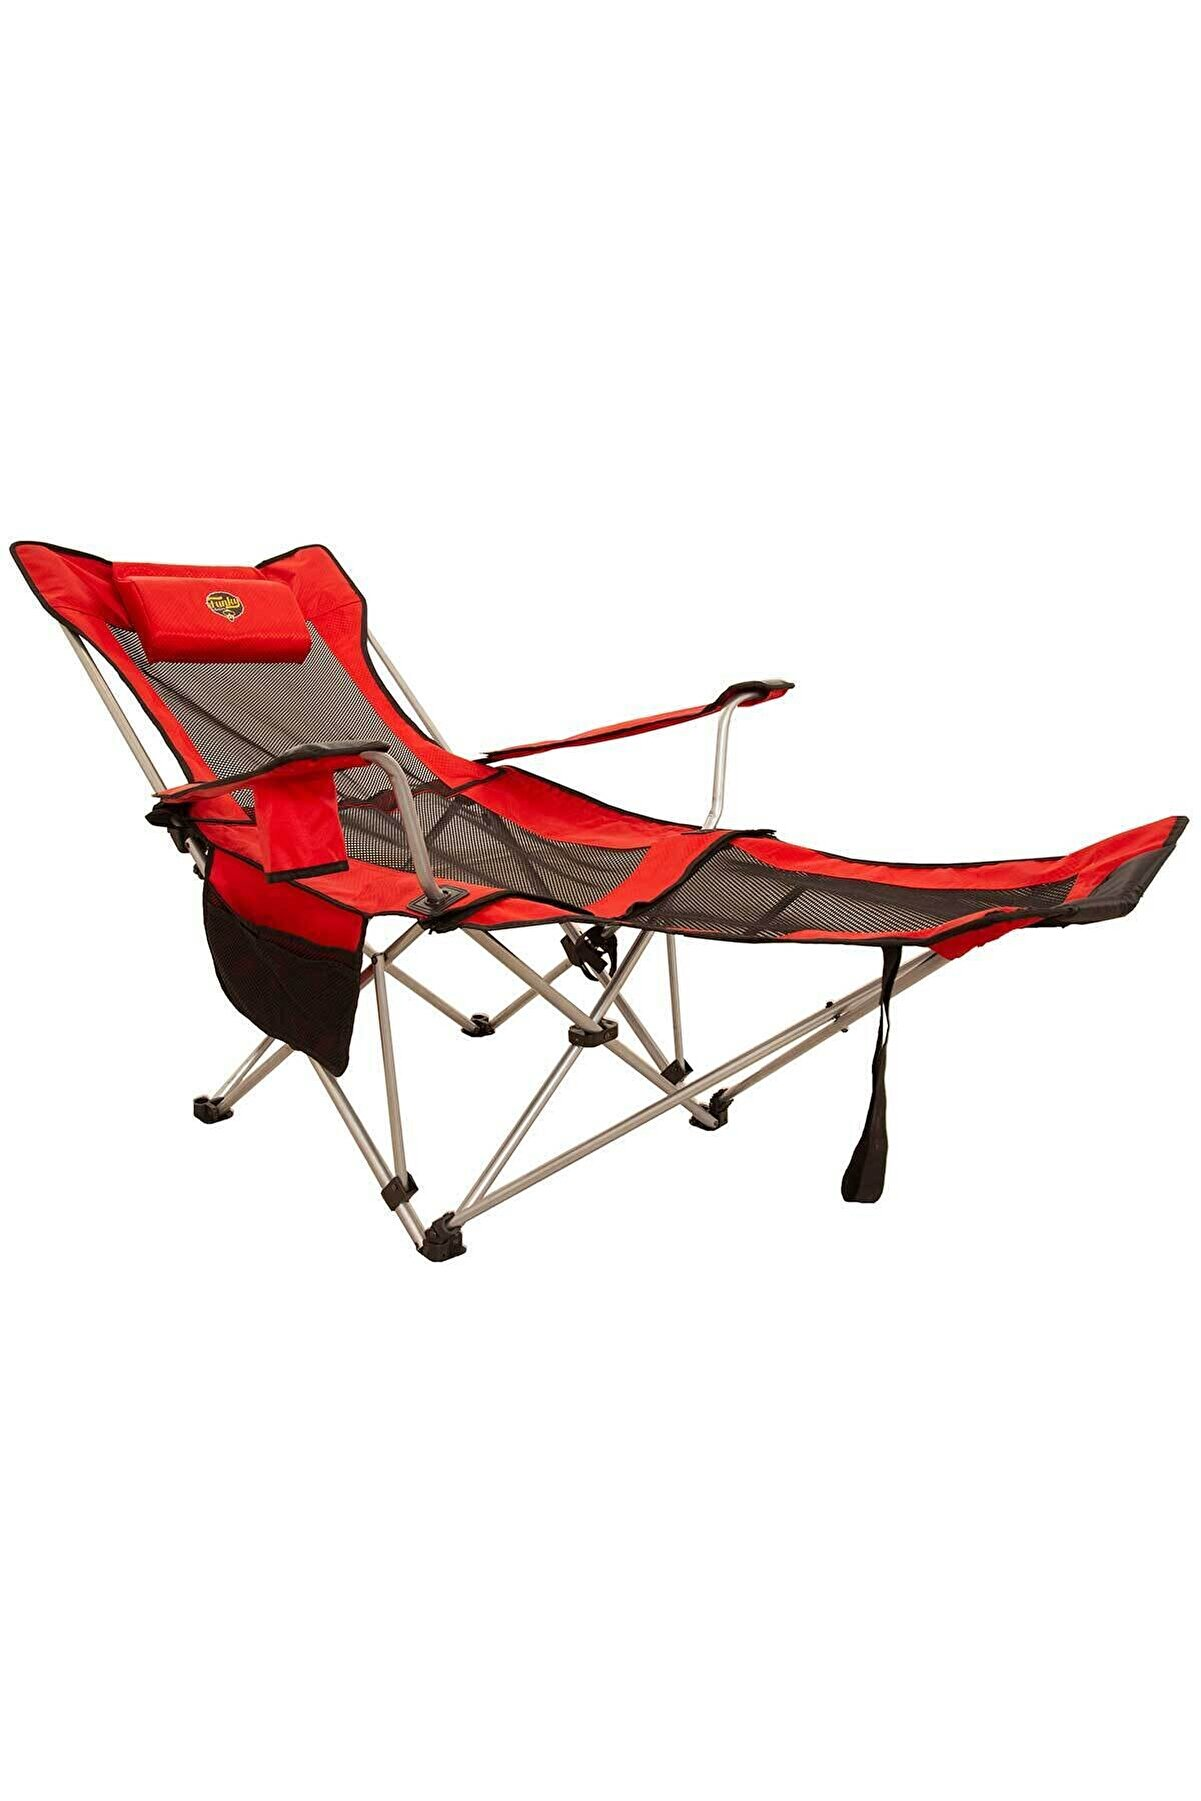 Funky Chairs Funky Chaırs Lazy 3 Plus Yatabilen Kamp Sandalyesi